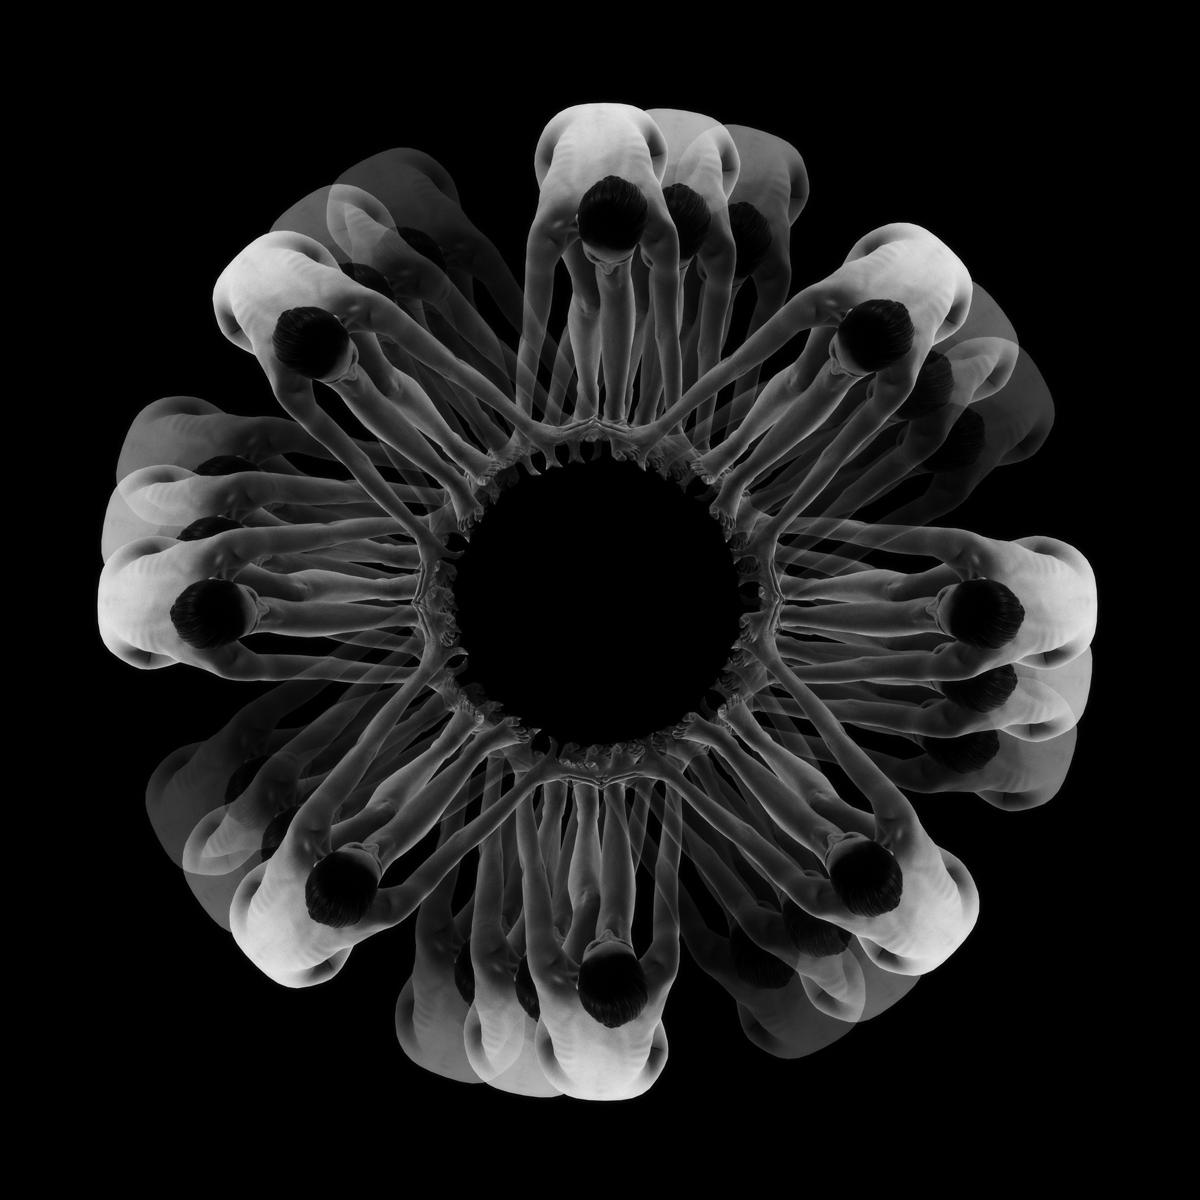 emel-karakozak-budding-nudes-abstract-photographer-01